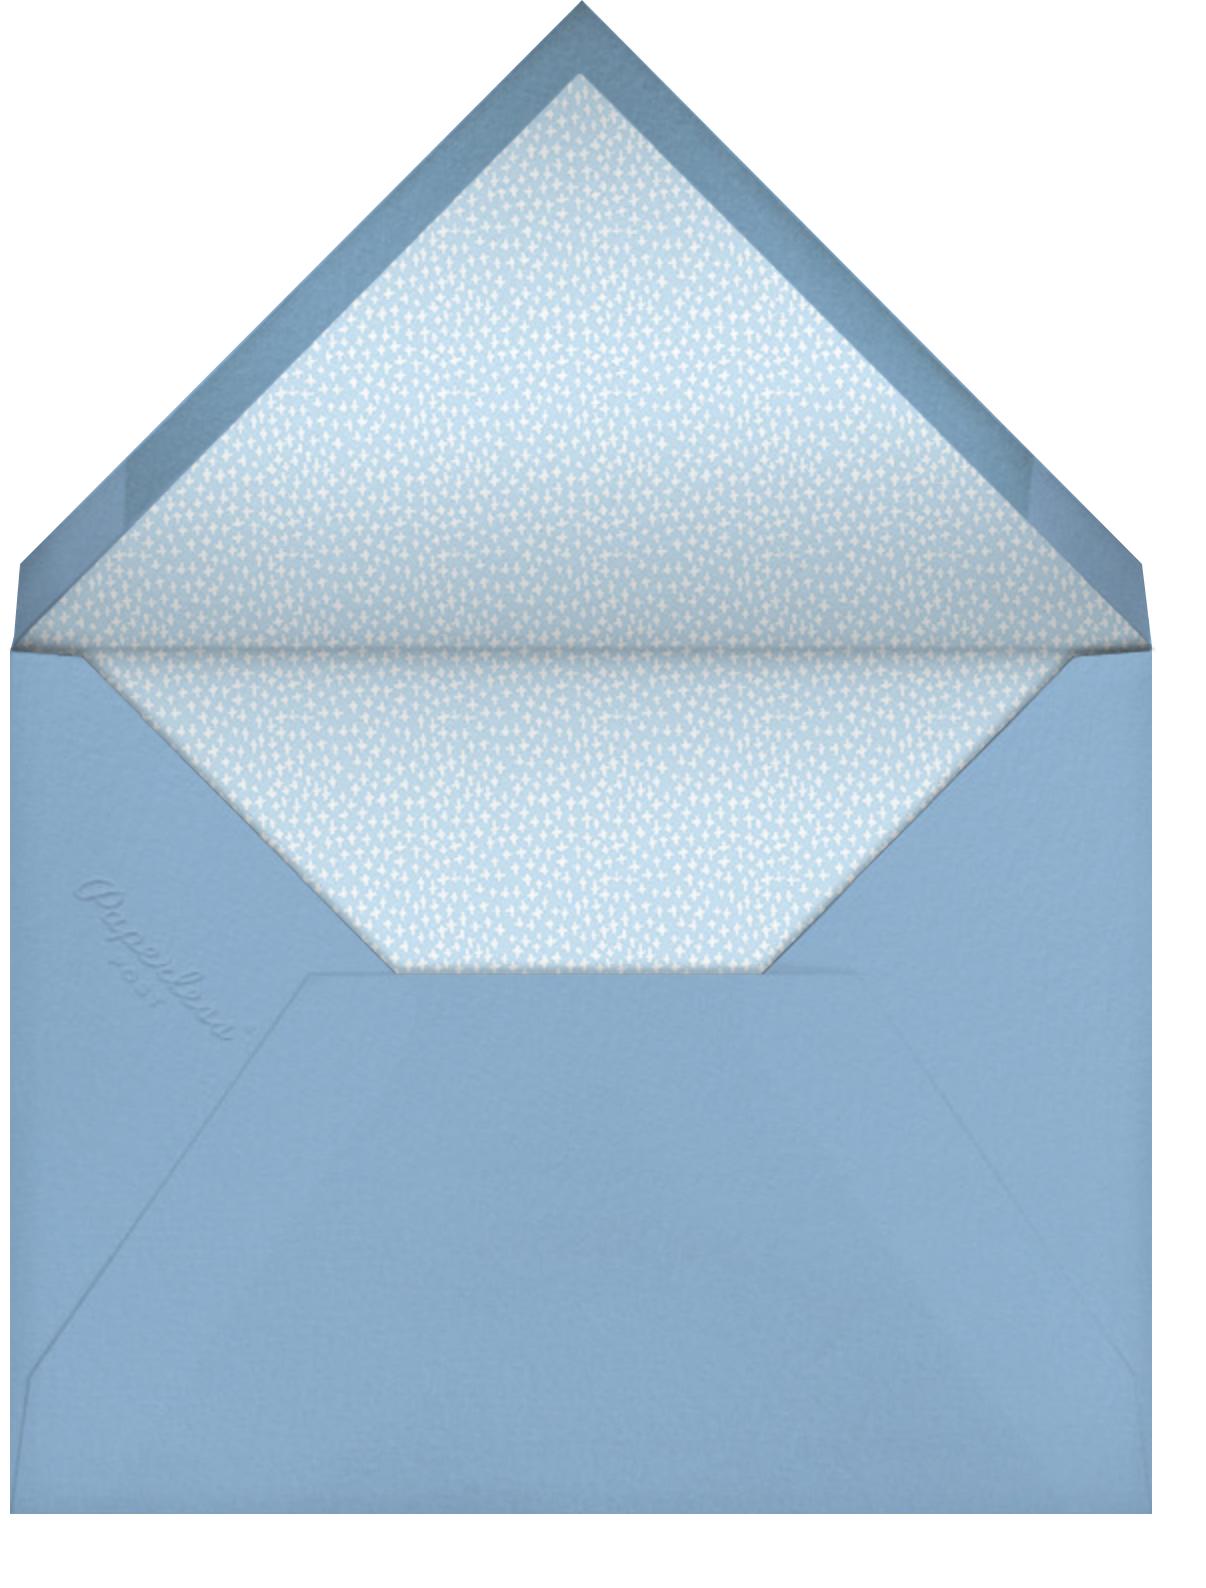 Circus Maximus - Mr. Boddington's Studio - Kids' birthday - envelope back